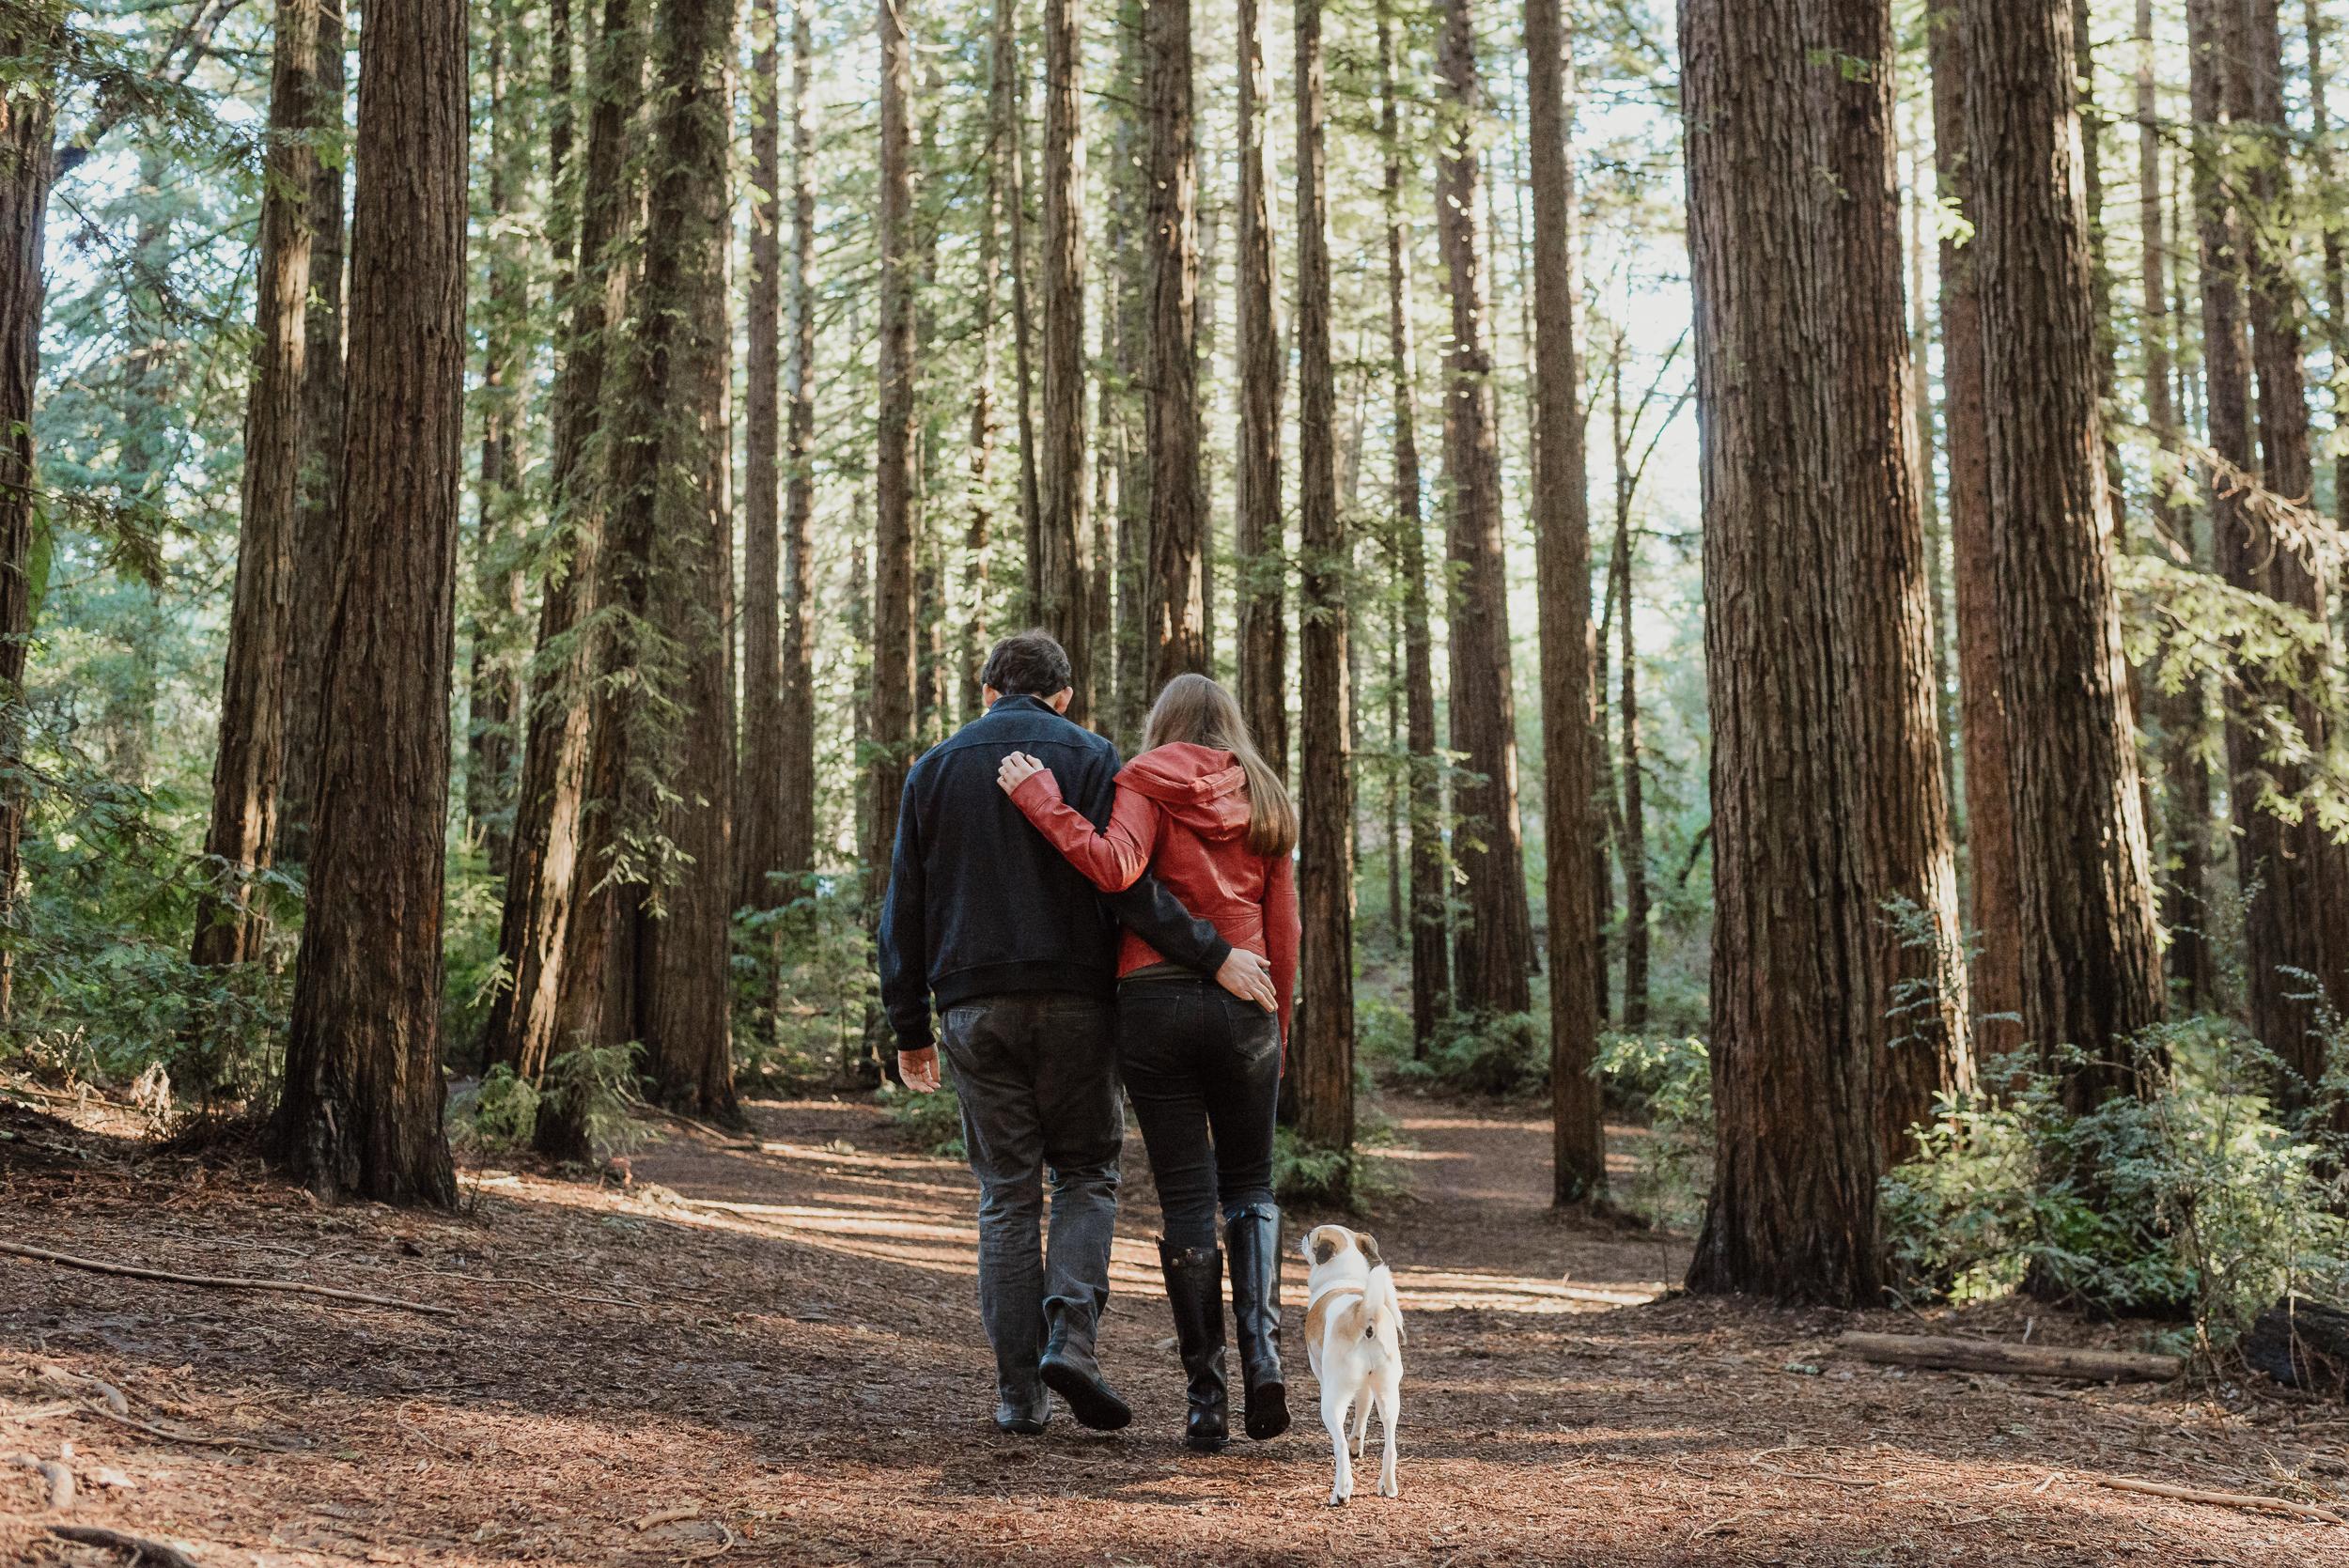 oakland-joaquin-miller-park-redwood-grove-engagement-session-vivianchen-015.jpg